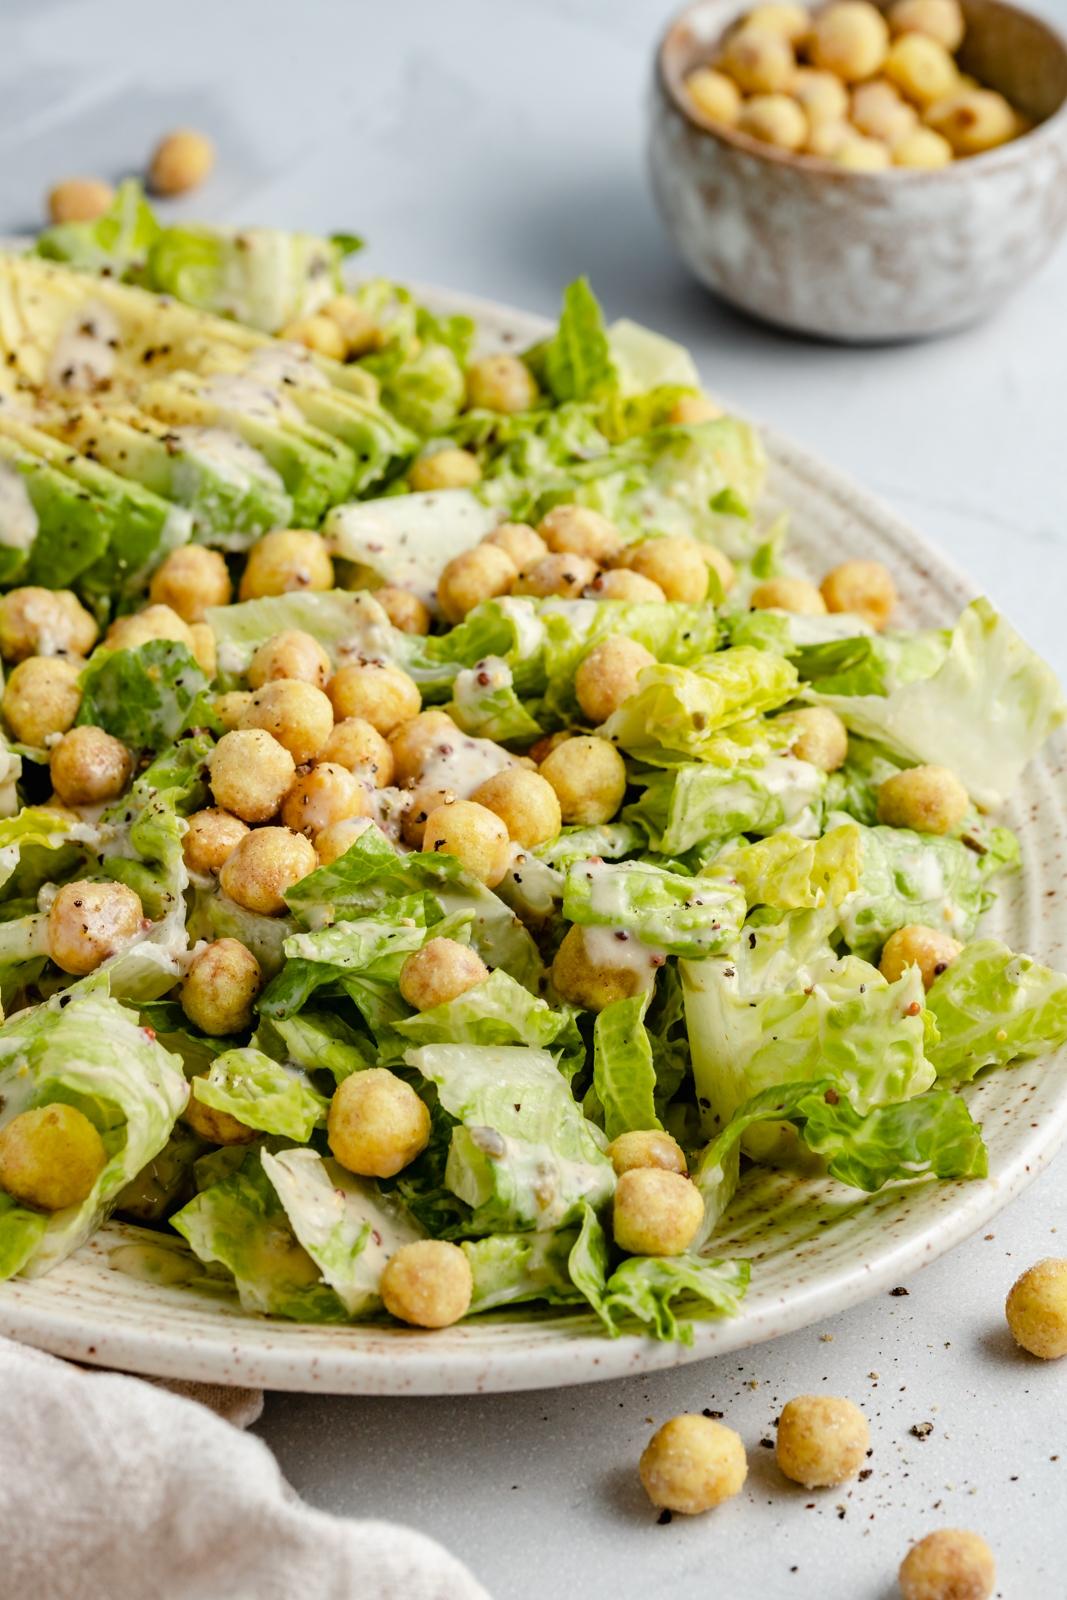 easy vegan caesar salad with chickpeas on a platter